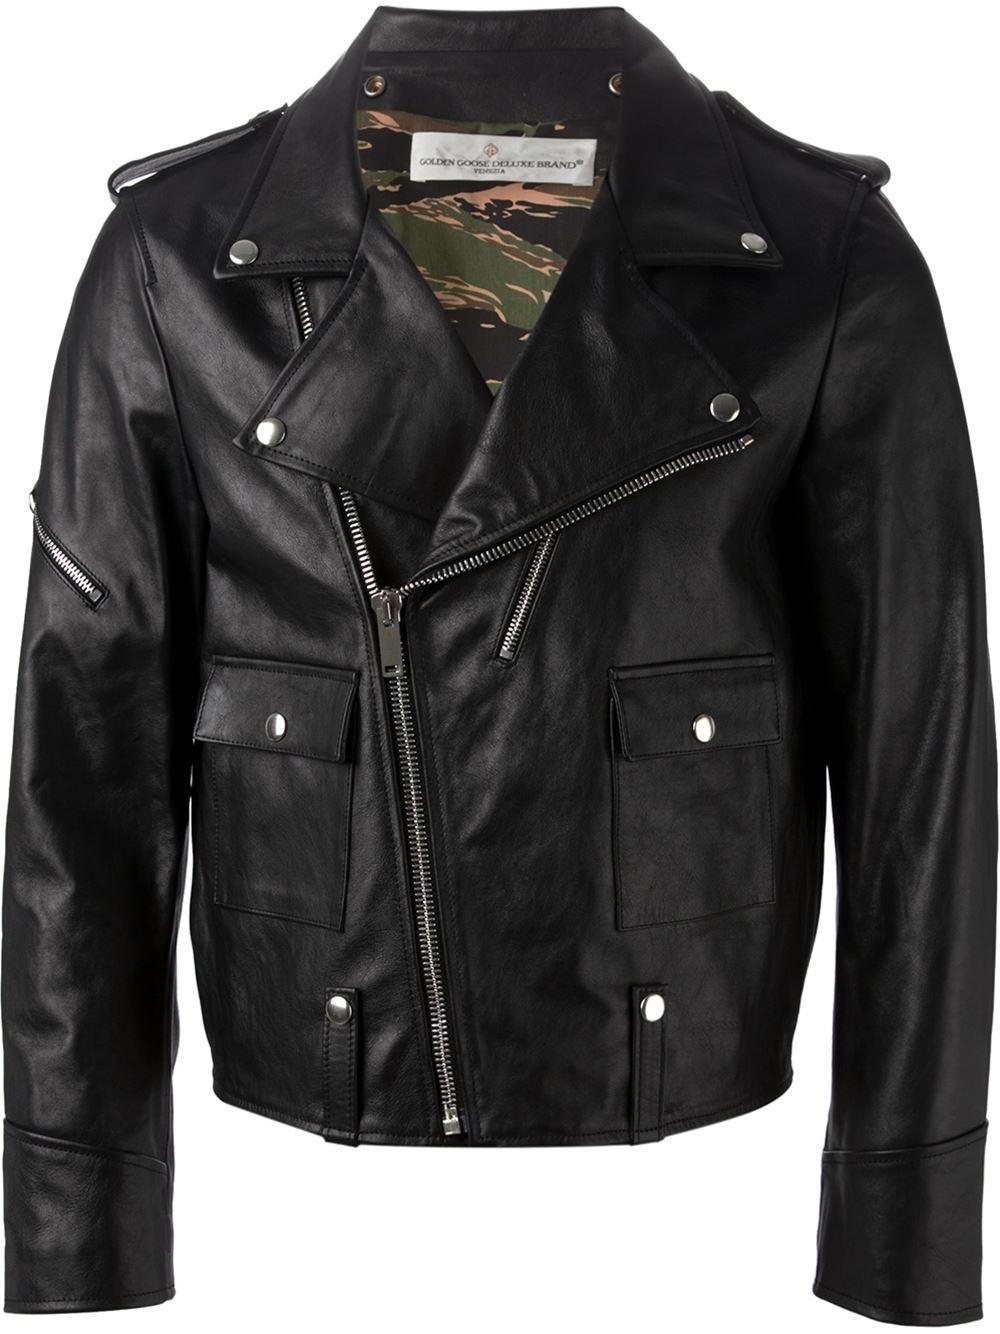 lyst golden goose deluxe brand classic biker jacket in black for men. Black Bedroom Furniture Sets. Home Design Ideas